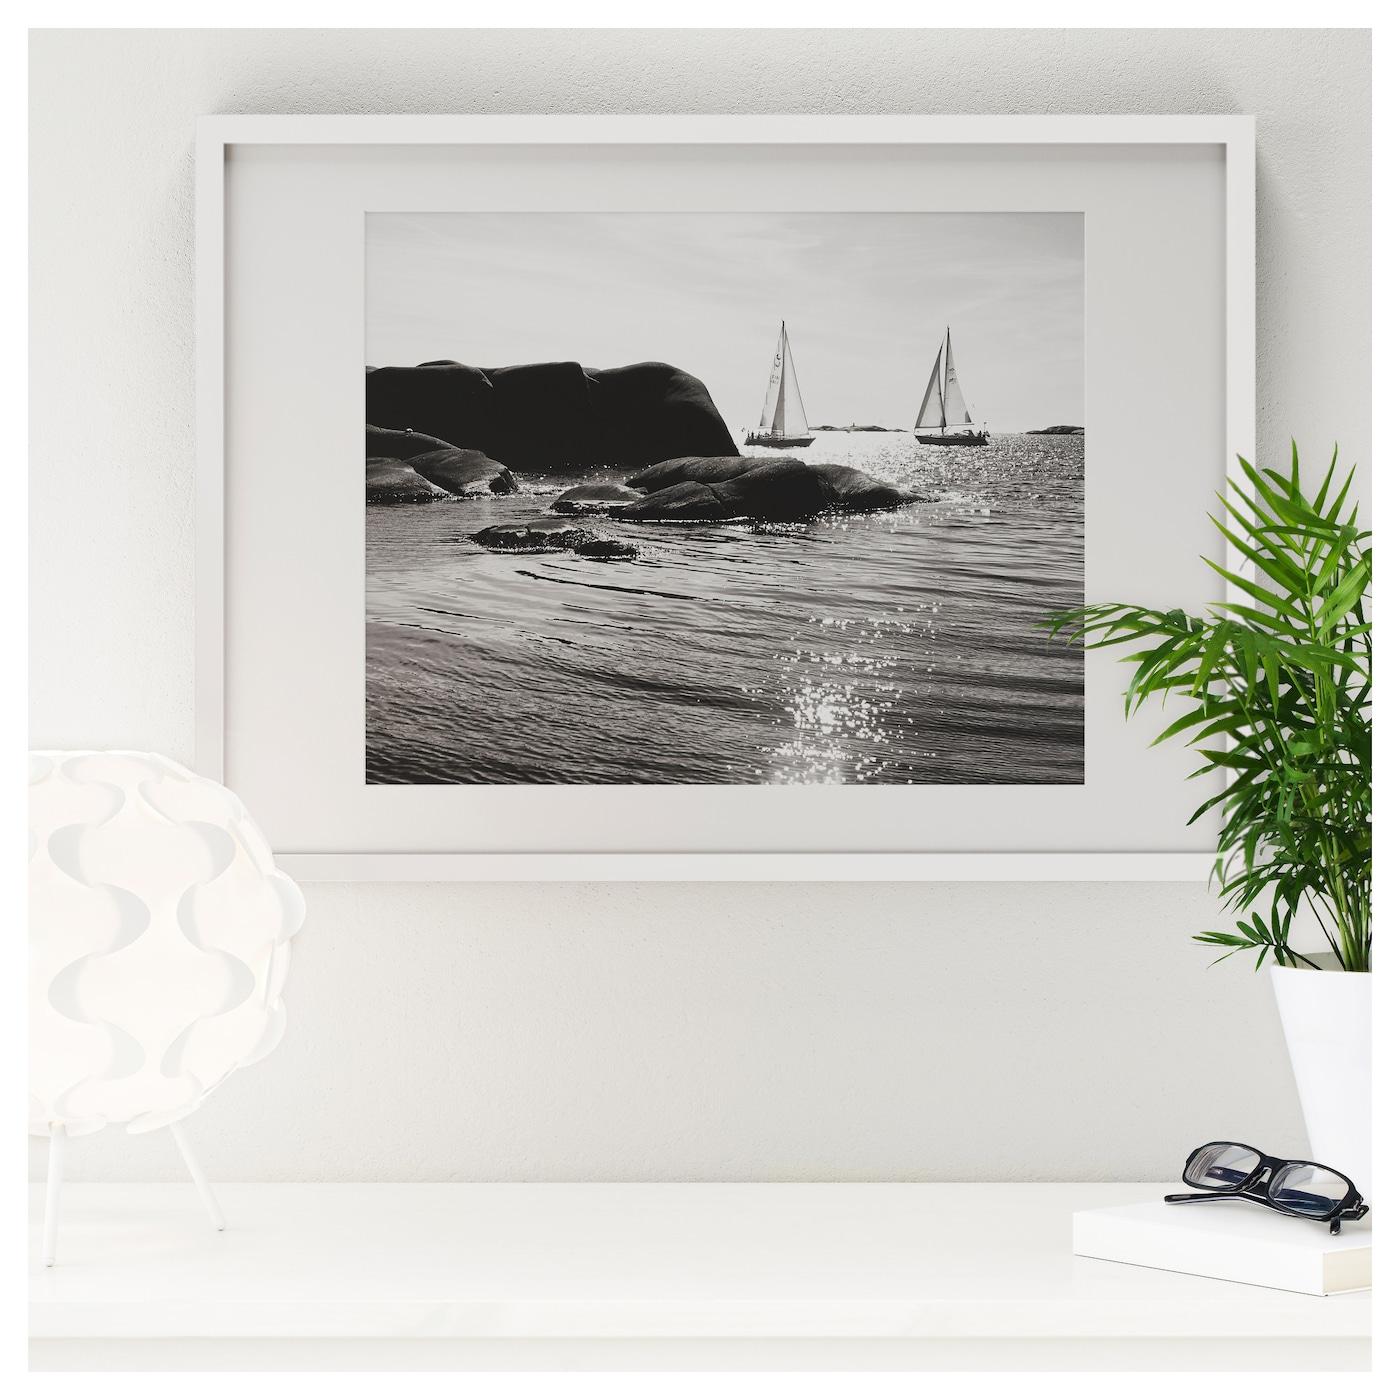 Ribba frame white 30x40 cm ikea for Cornice ribba ikea